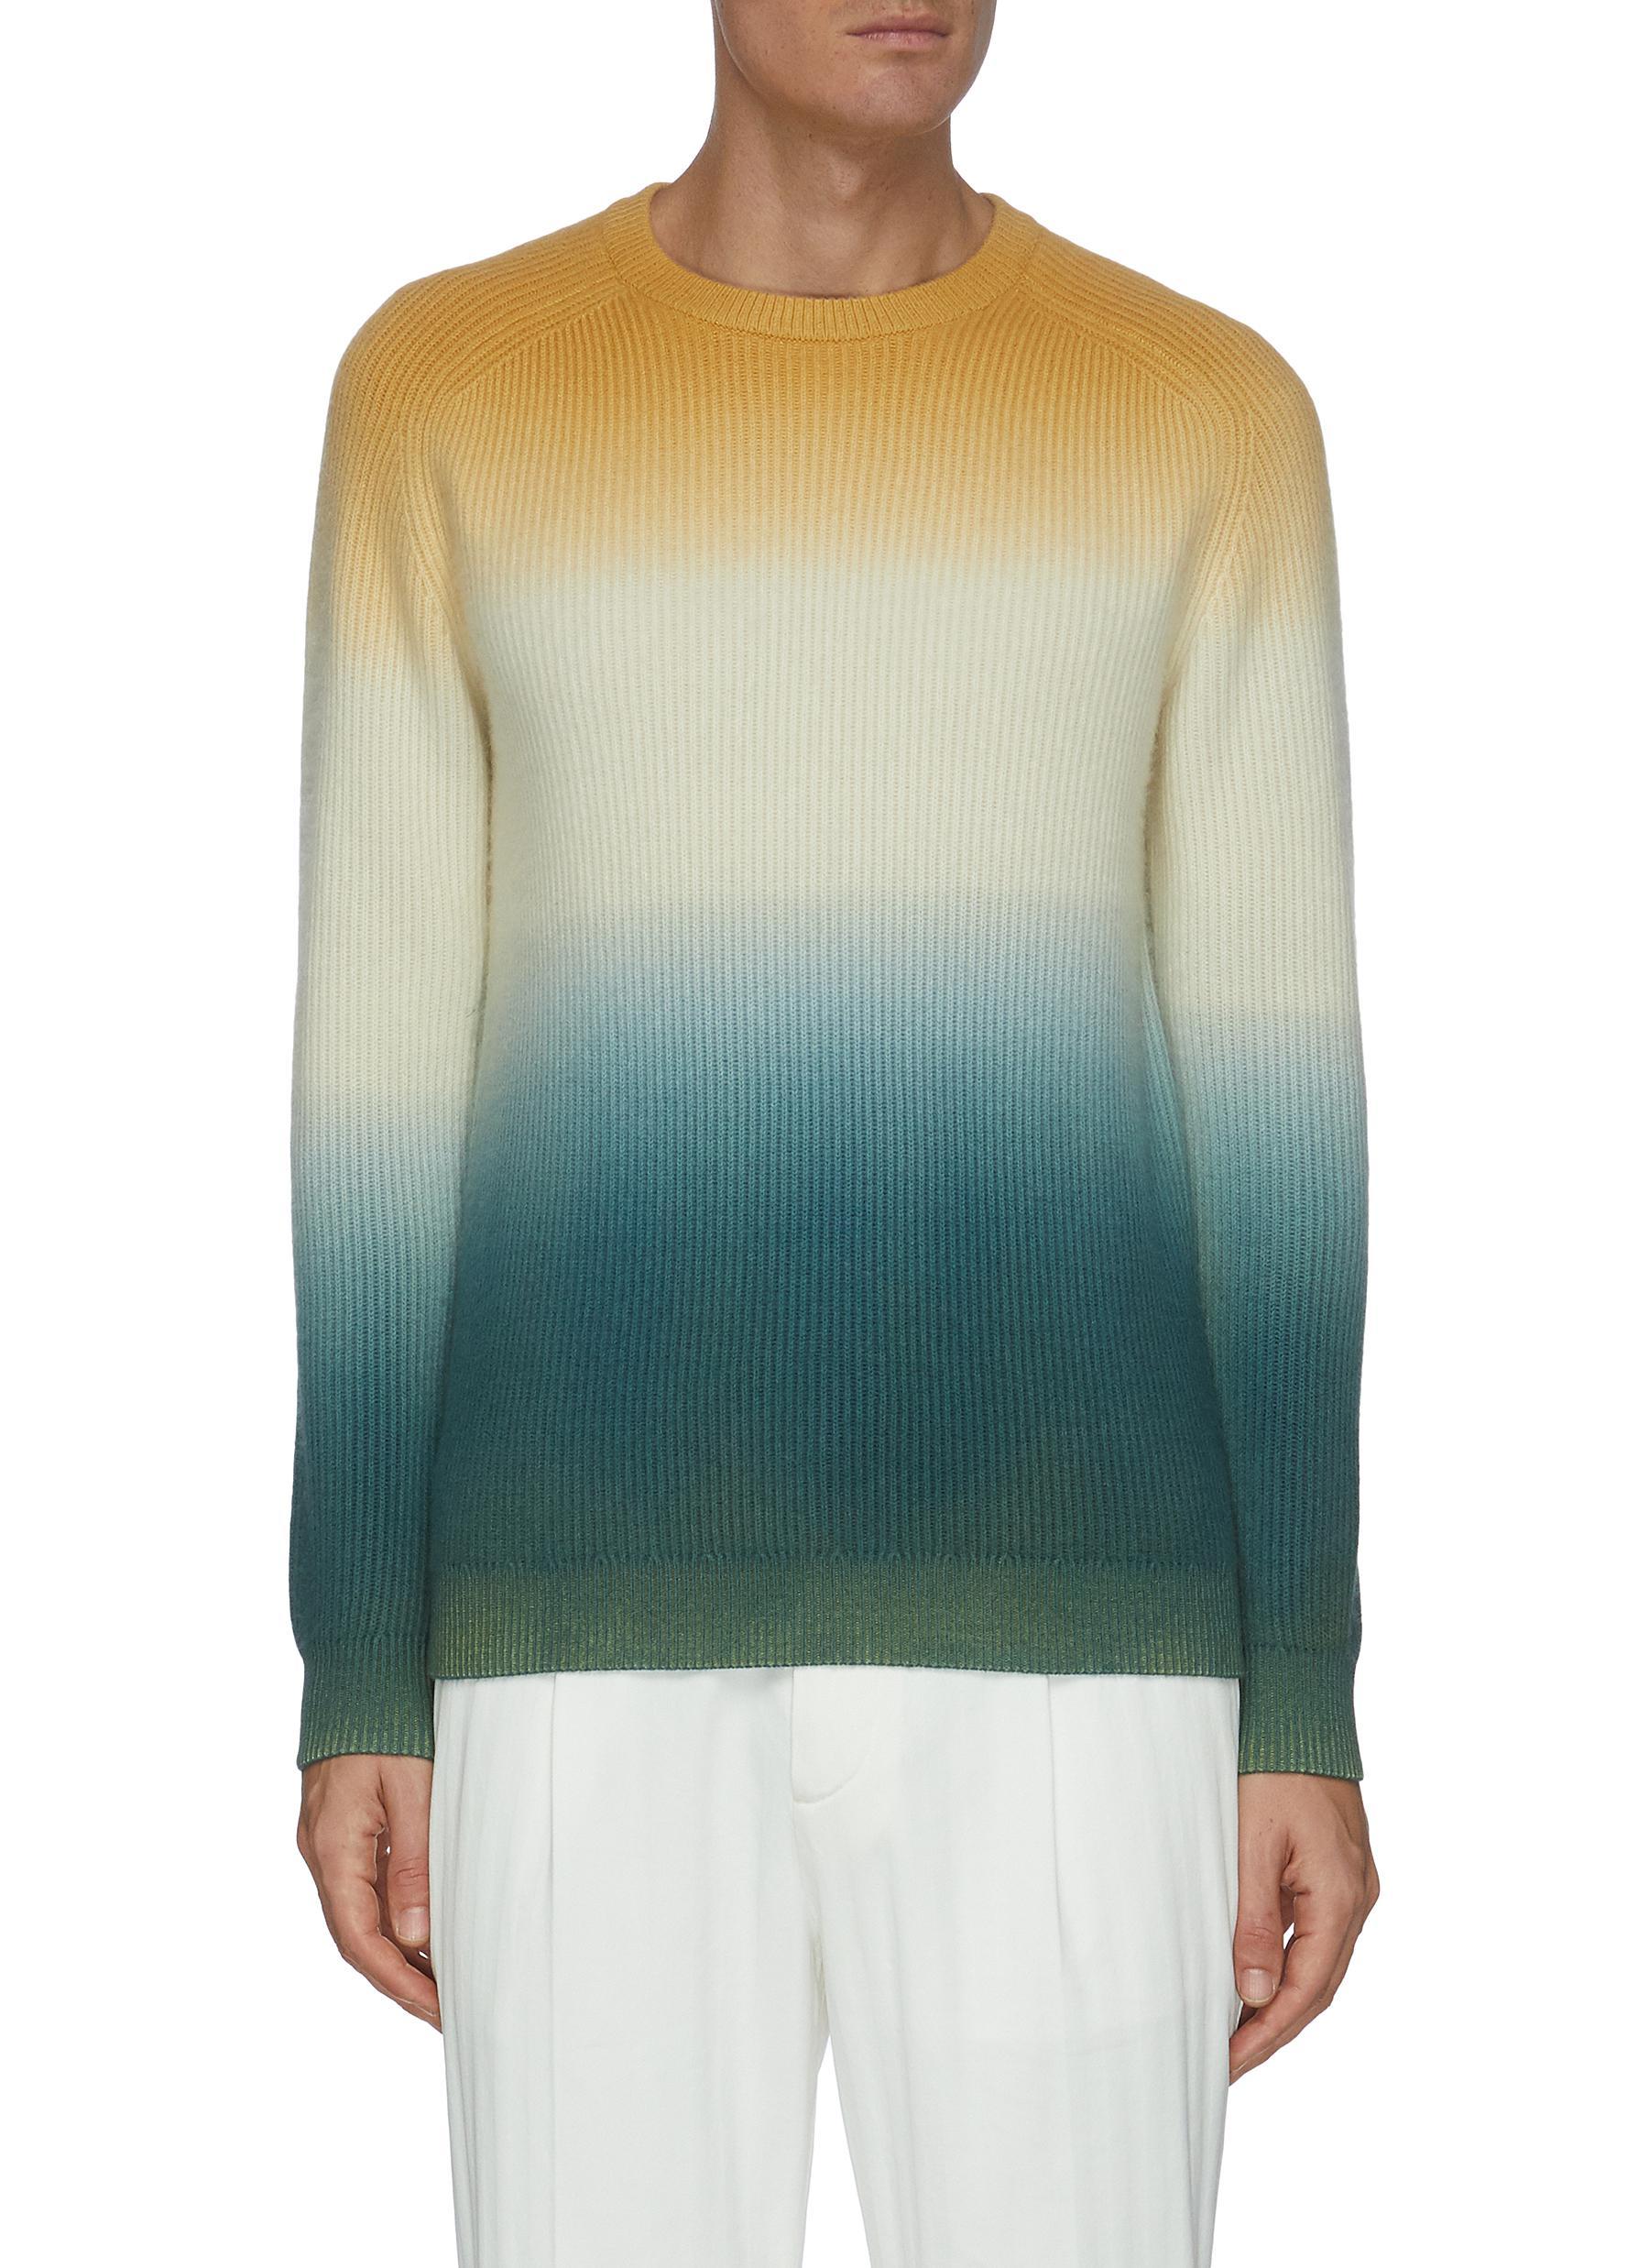 Horizontal Gradient rib knit cashmere sweater